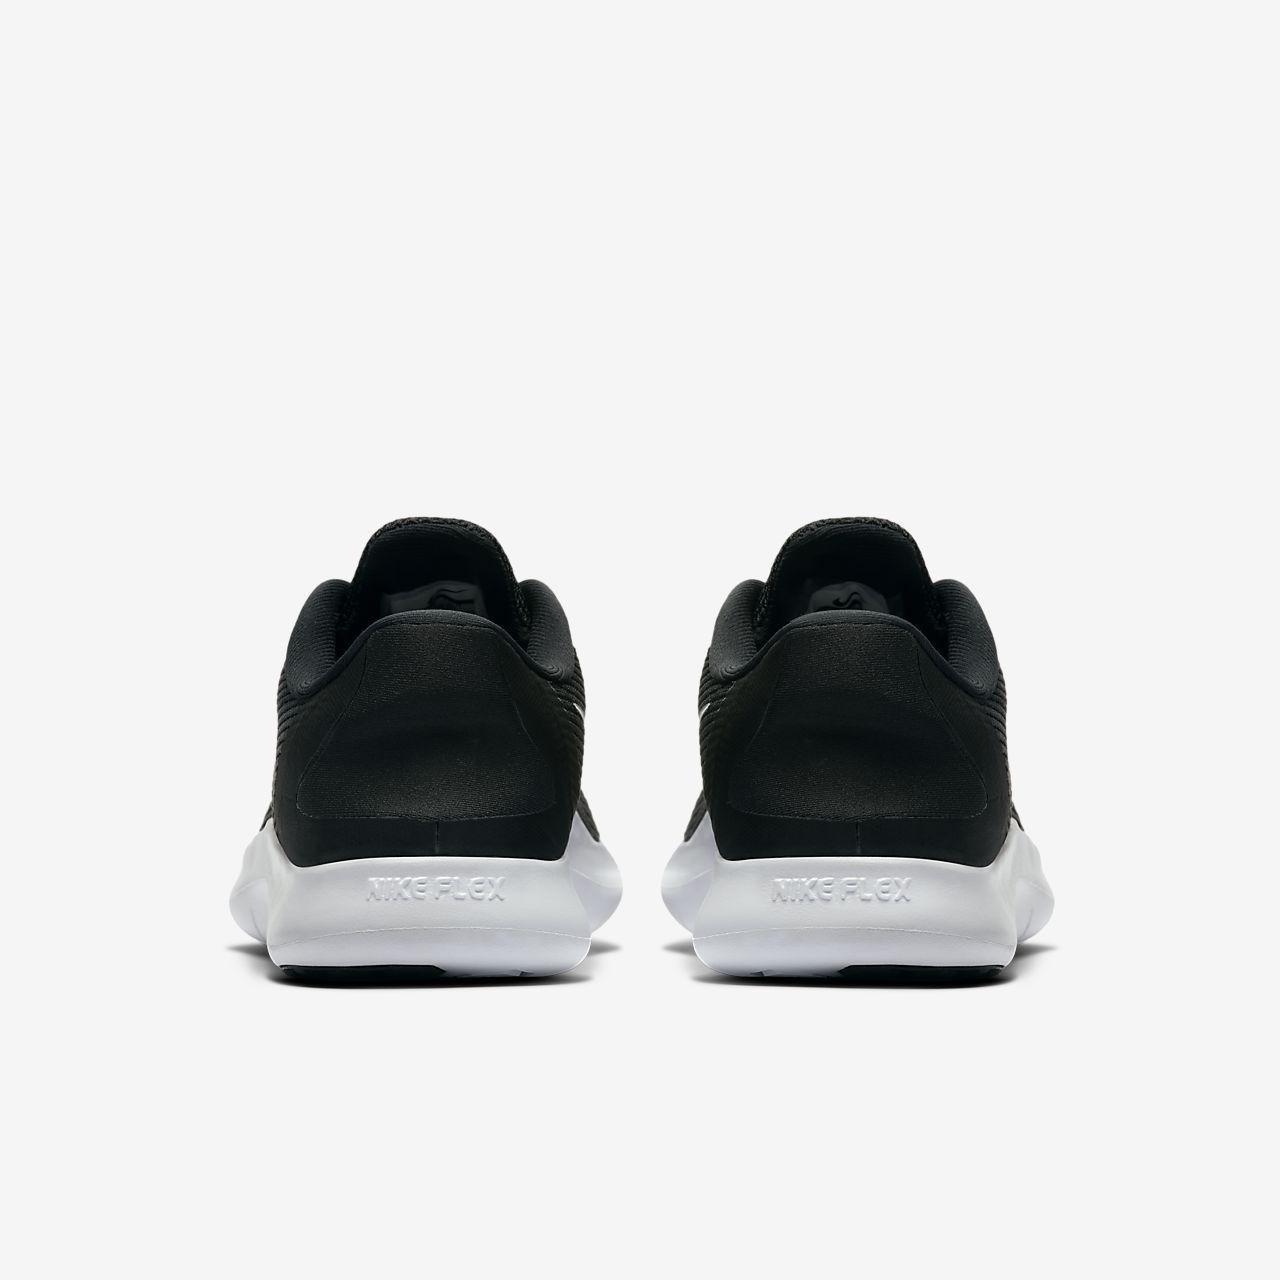 Trend Nike Flex Experience Run 5 Laufschuhe Anthracite